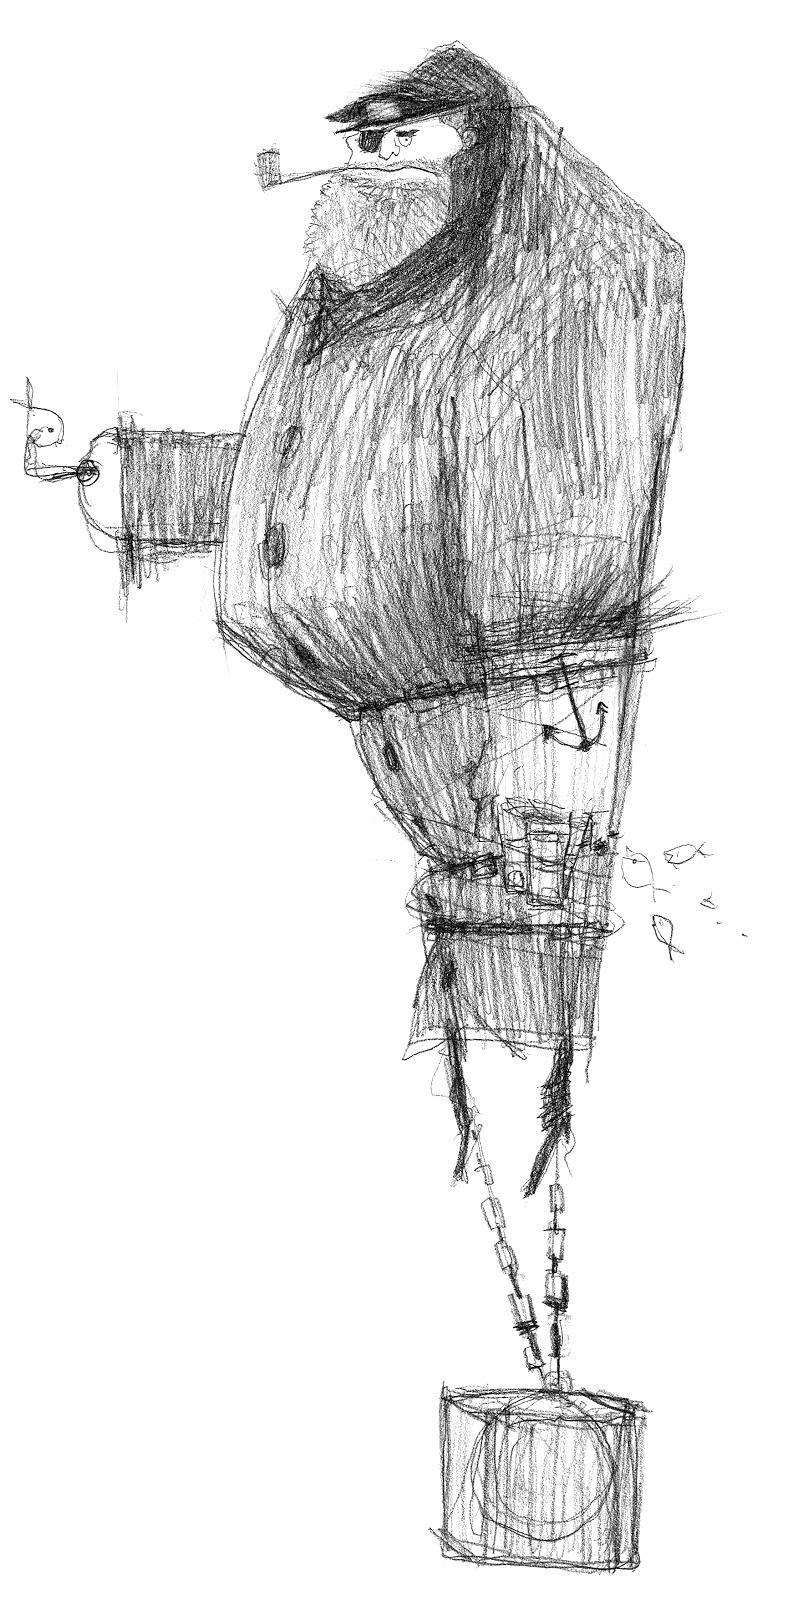 094i-paranorman-concept-art-character-design-Blocky_seaman_ghost_1.jpg